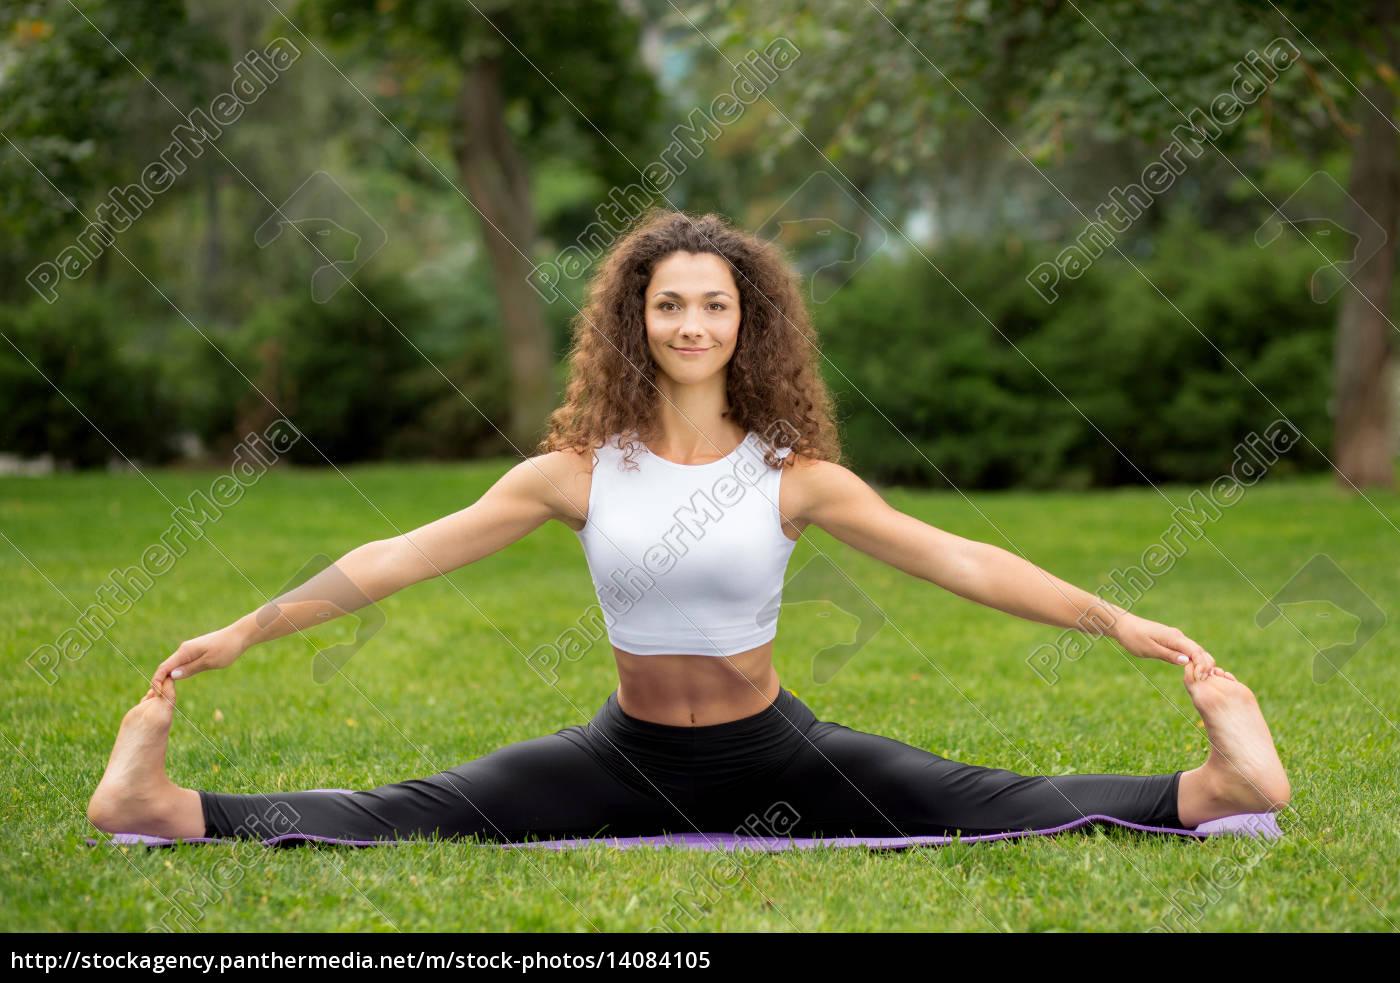 smiling, pretty, woman, doing, yoga, exercises - 14084105